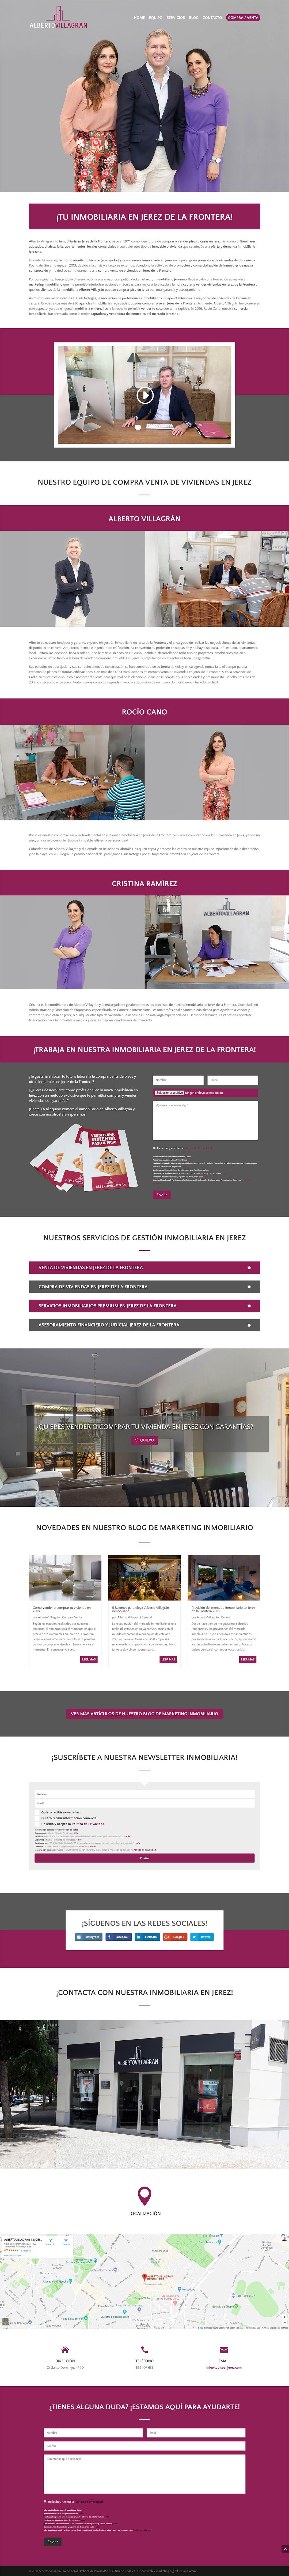 Página web Alberto Villagrán Inmobiliaria